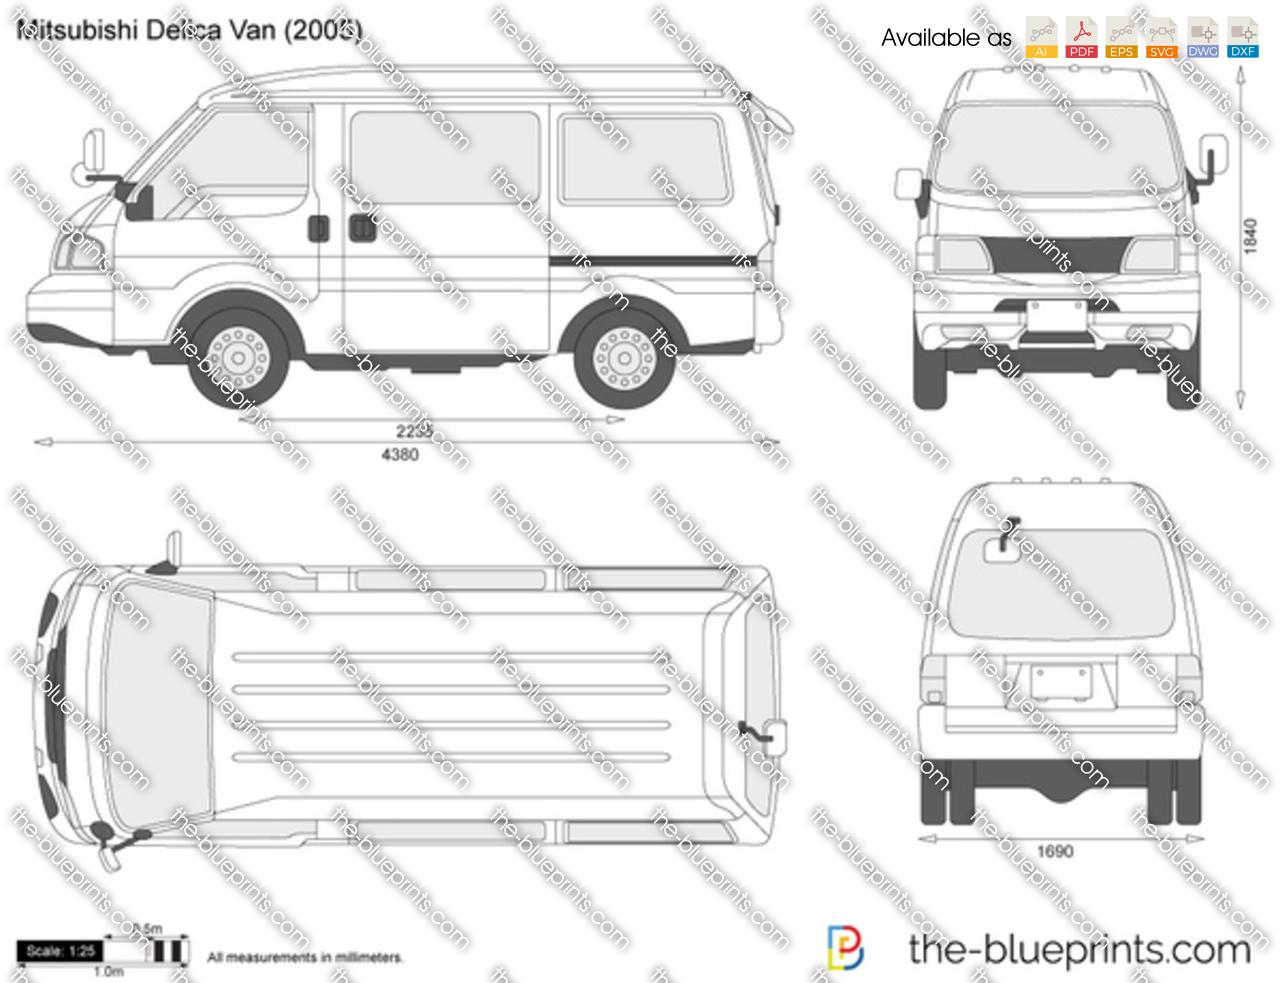 Mitsubishi Delica Van 2002